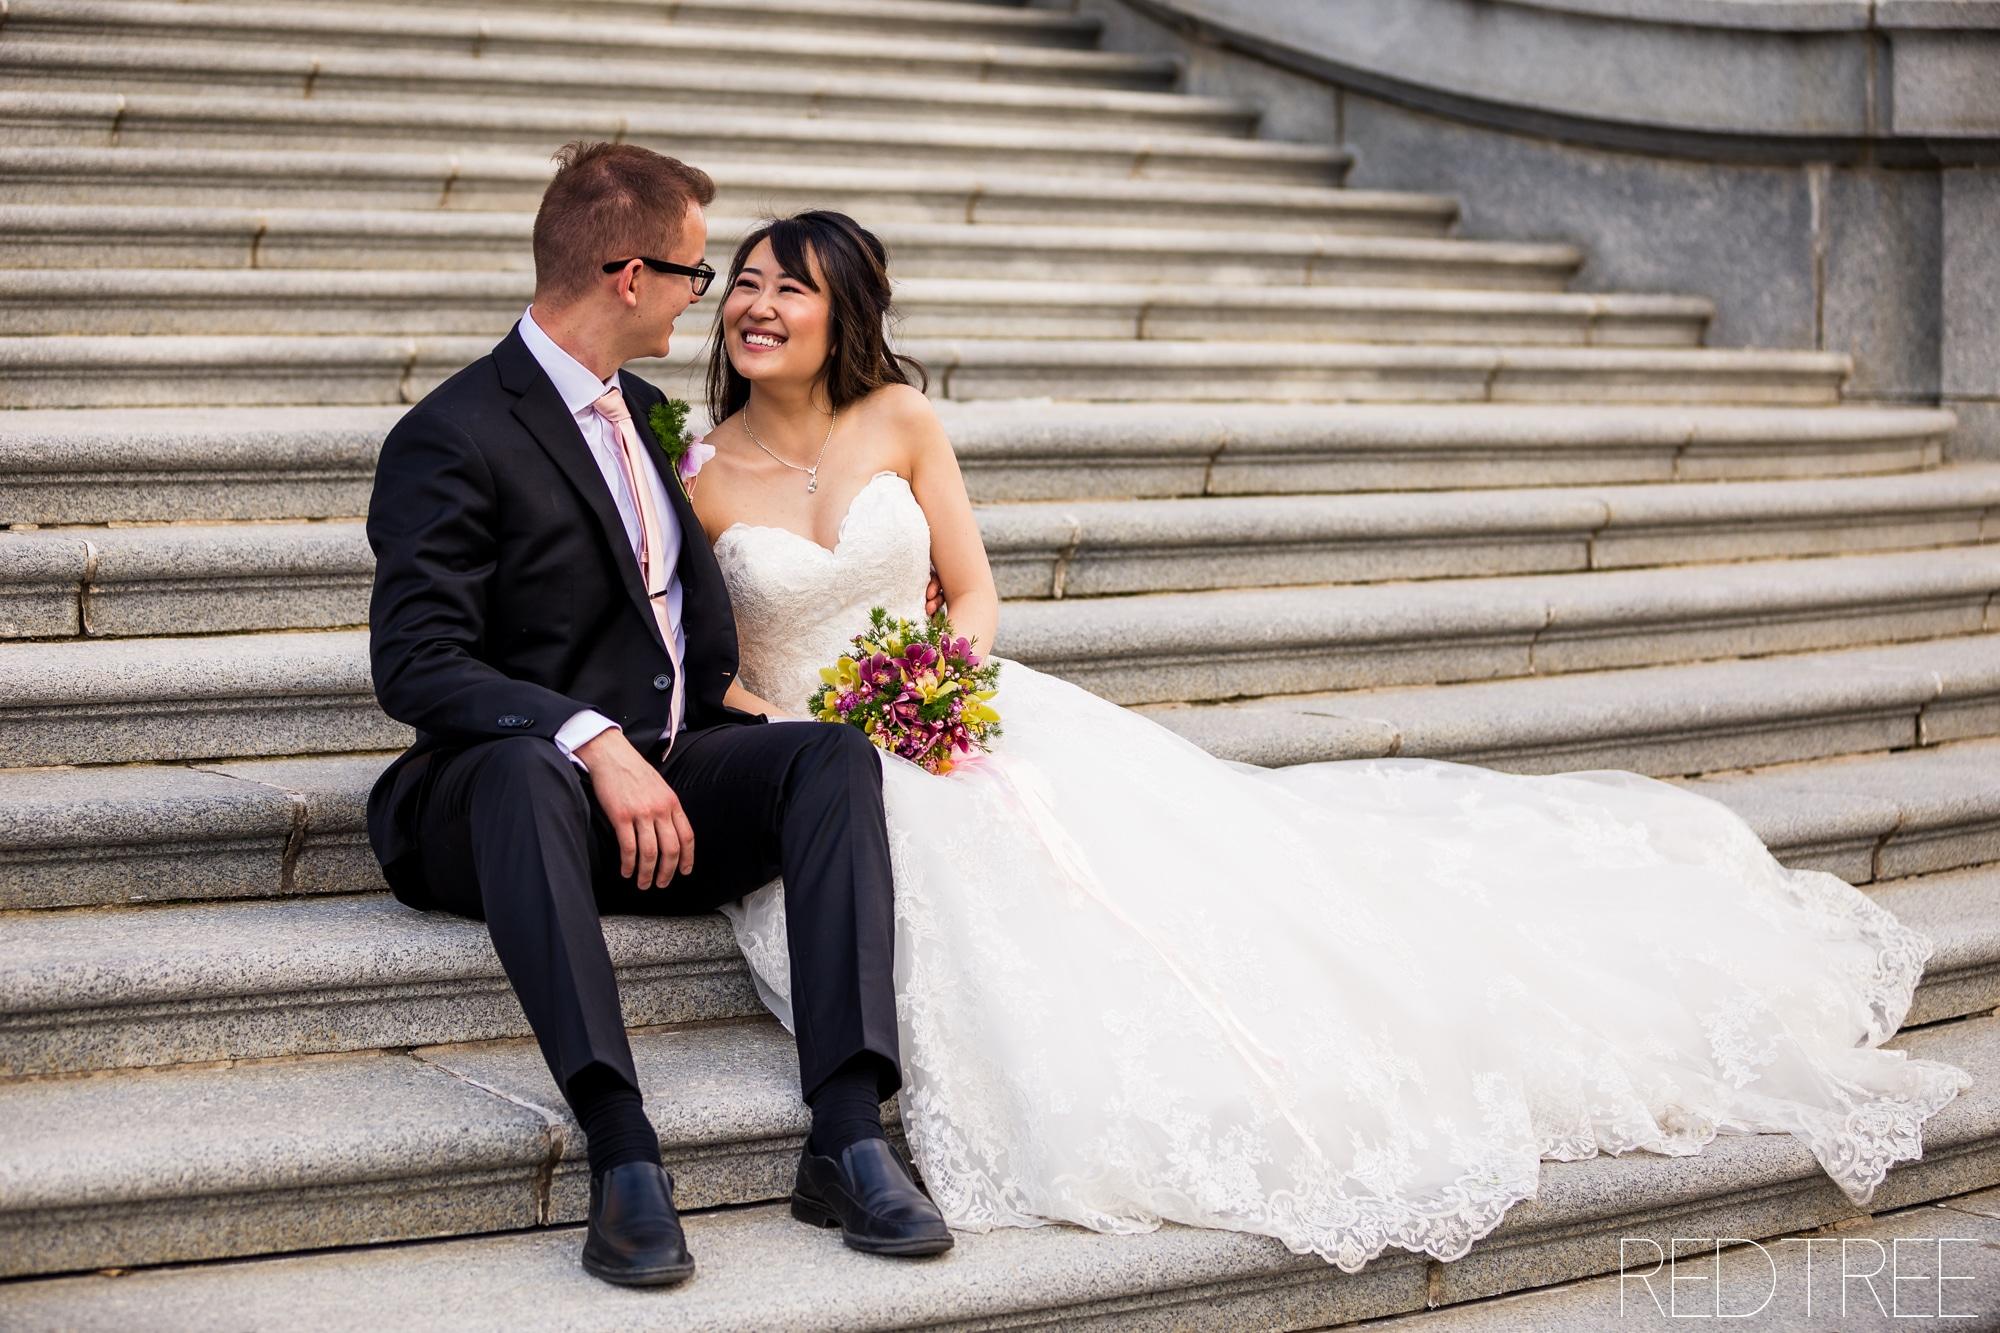 Hastings Lake Gardens & Alberta Legislature Wedding: Edmonton Wedding Photography